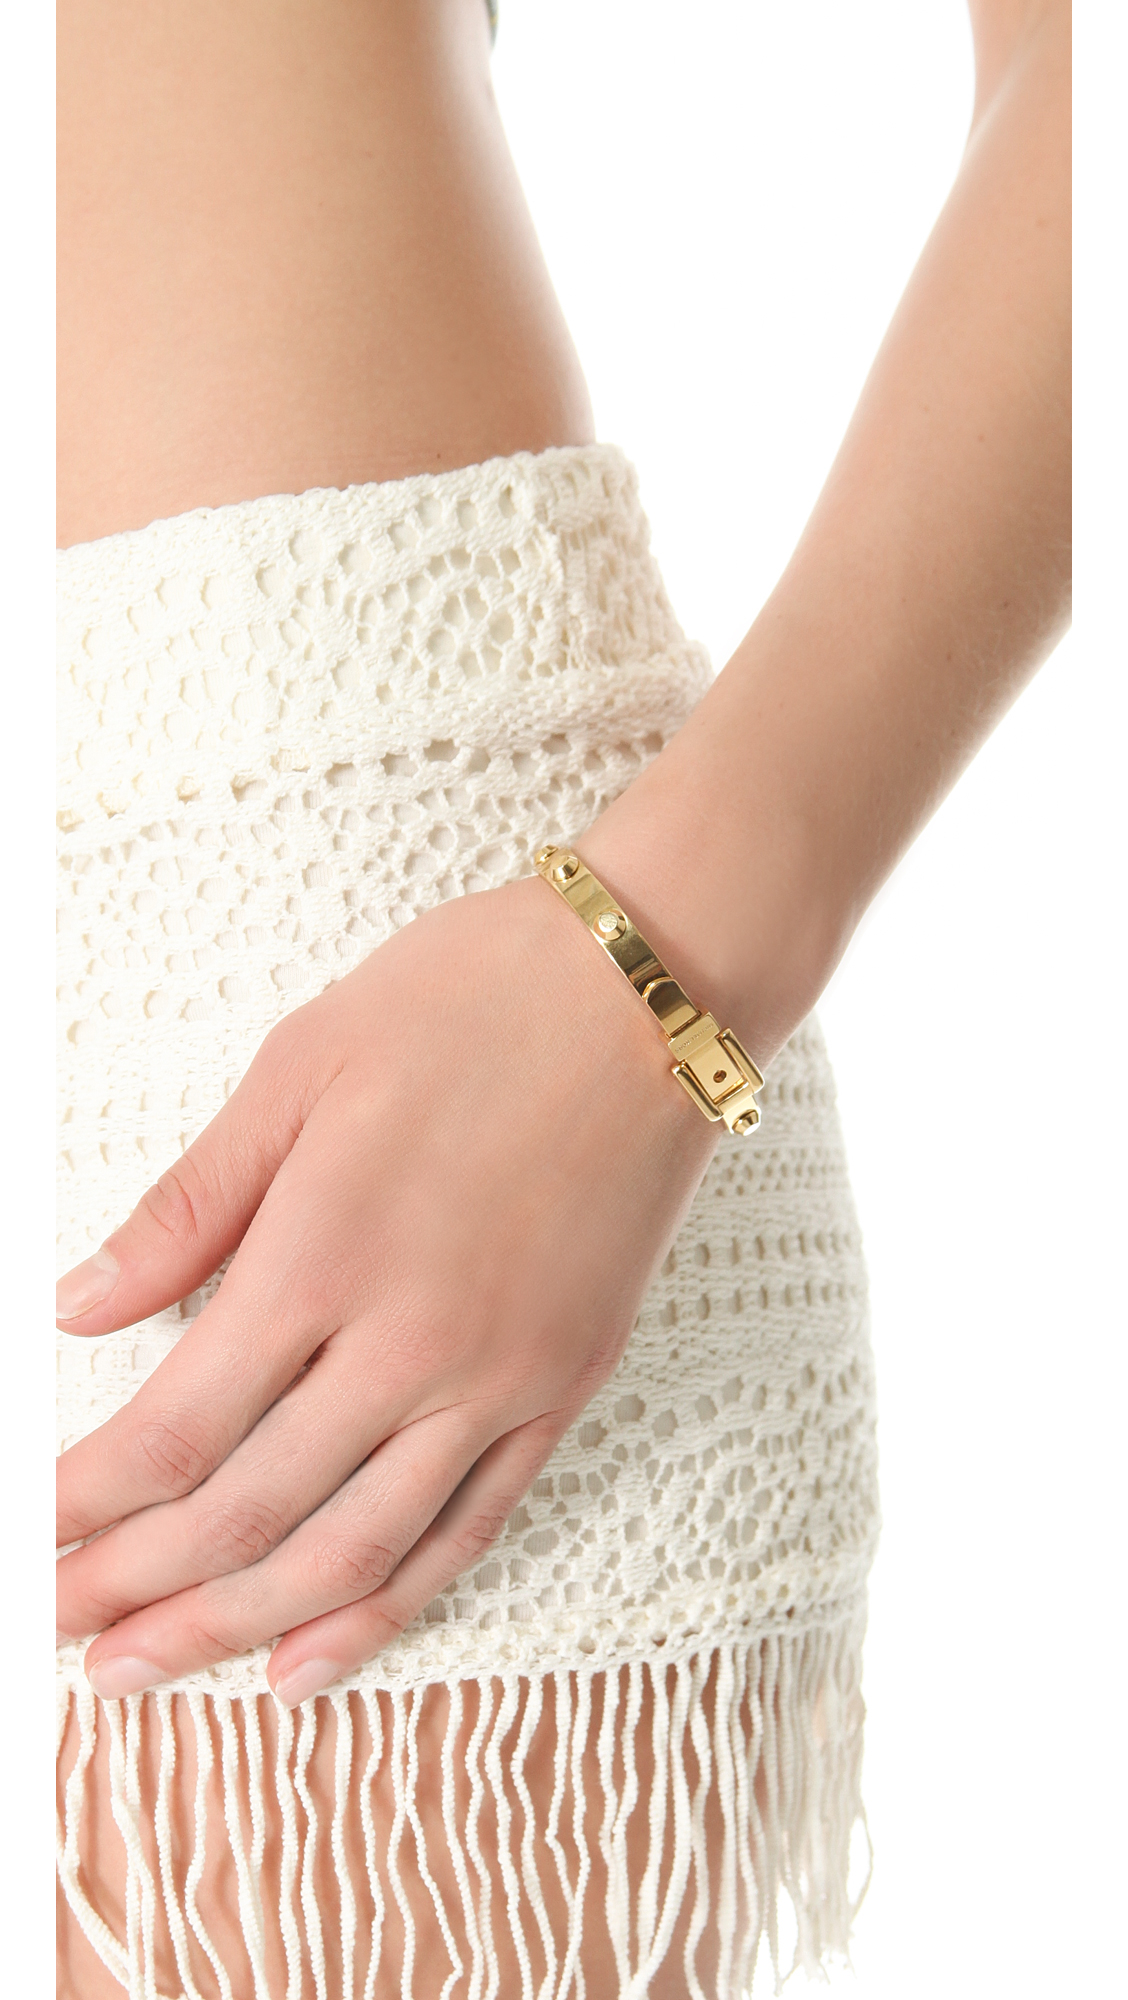 Michael Kors Astor Buckle Bangle - Gold in Metallic